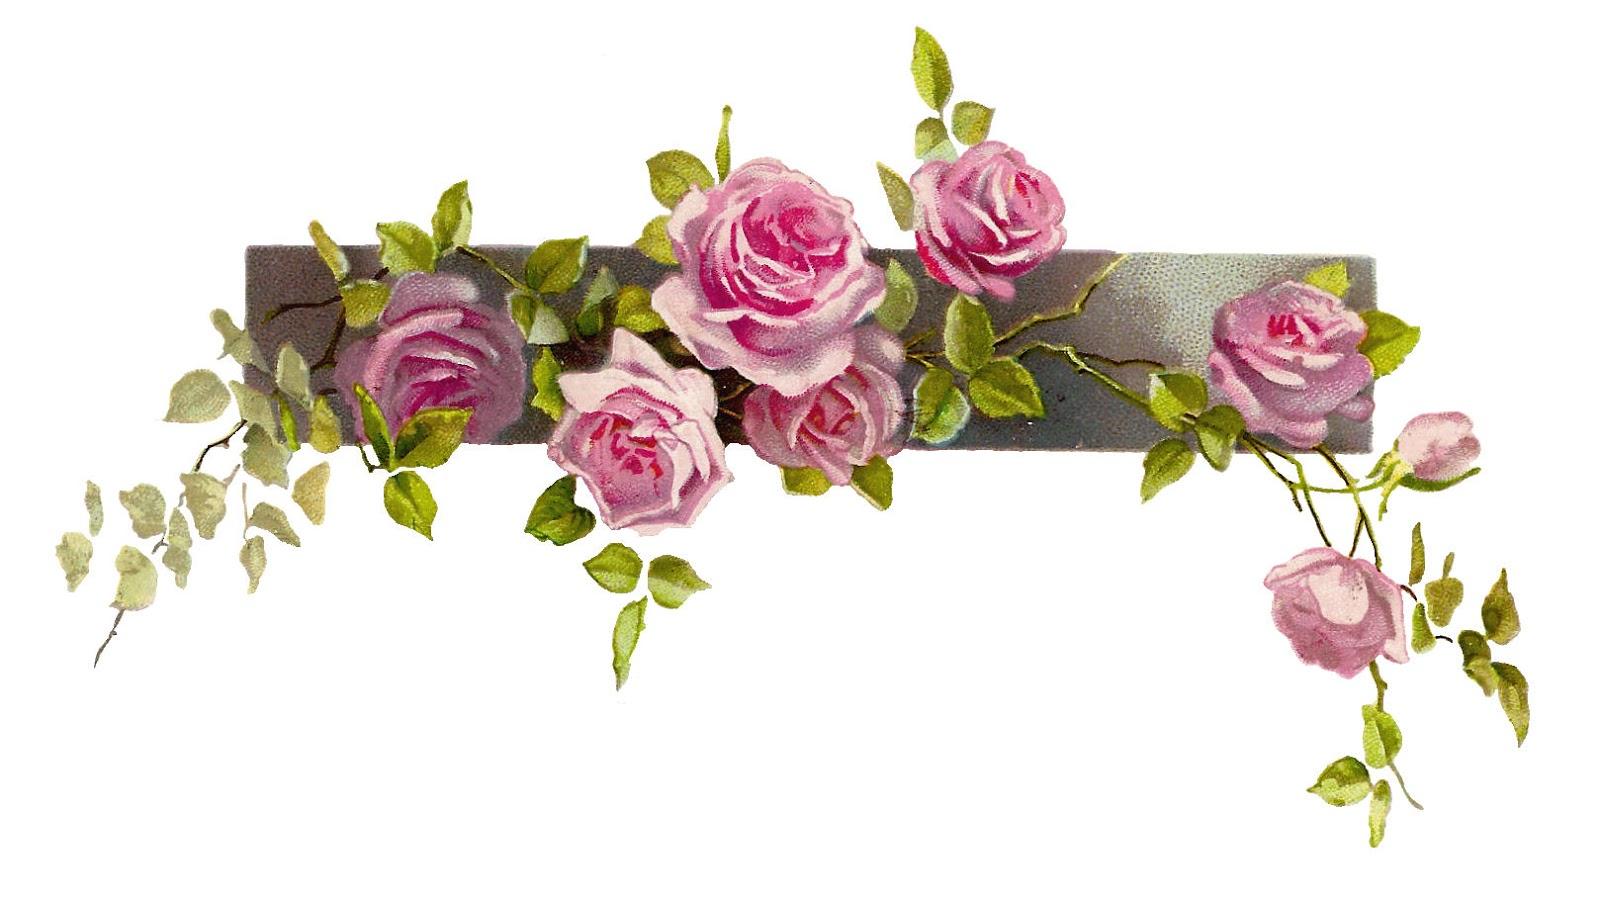 Flower border clipart png